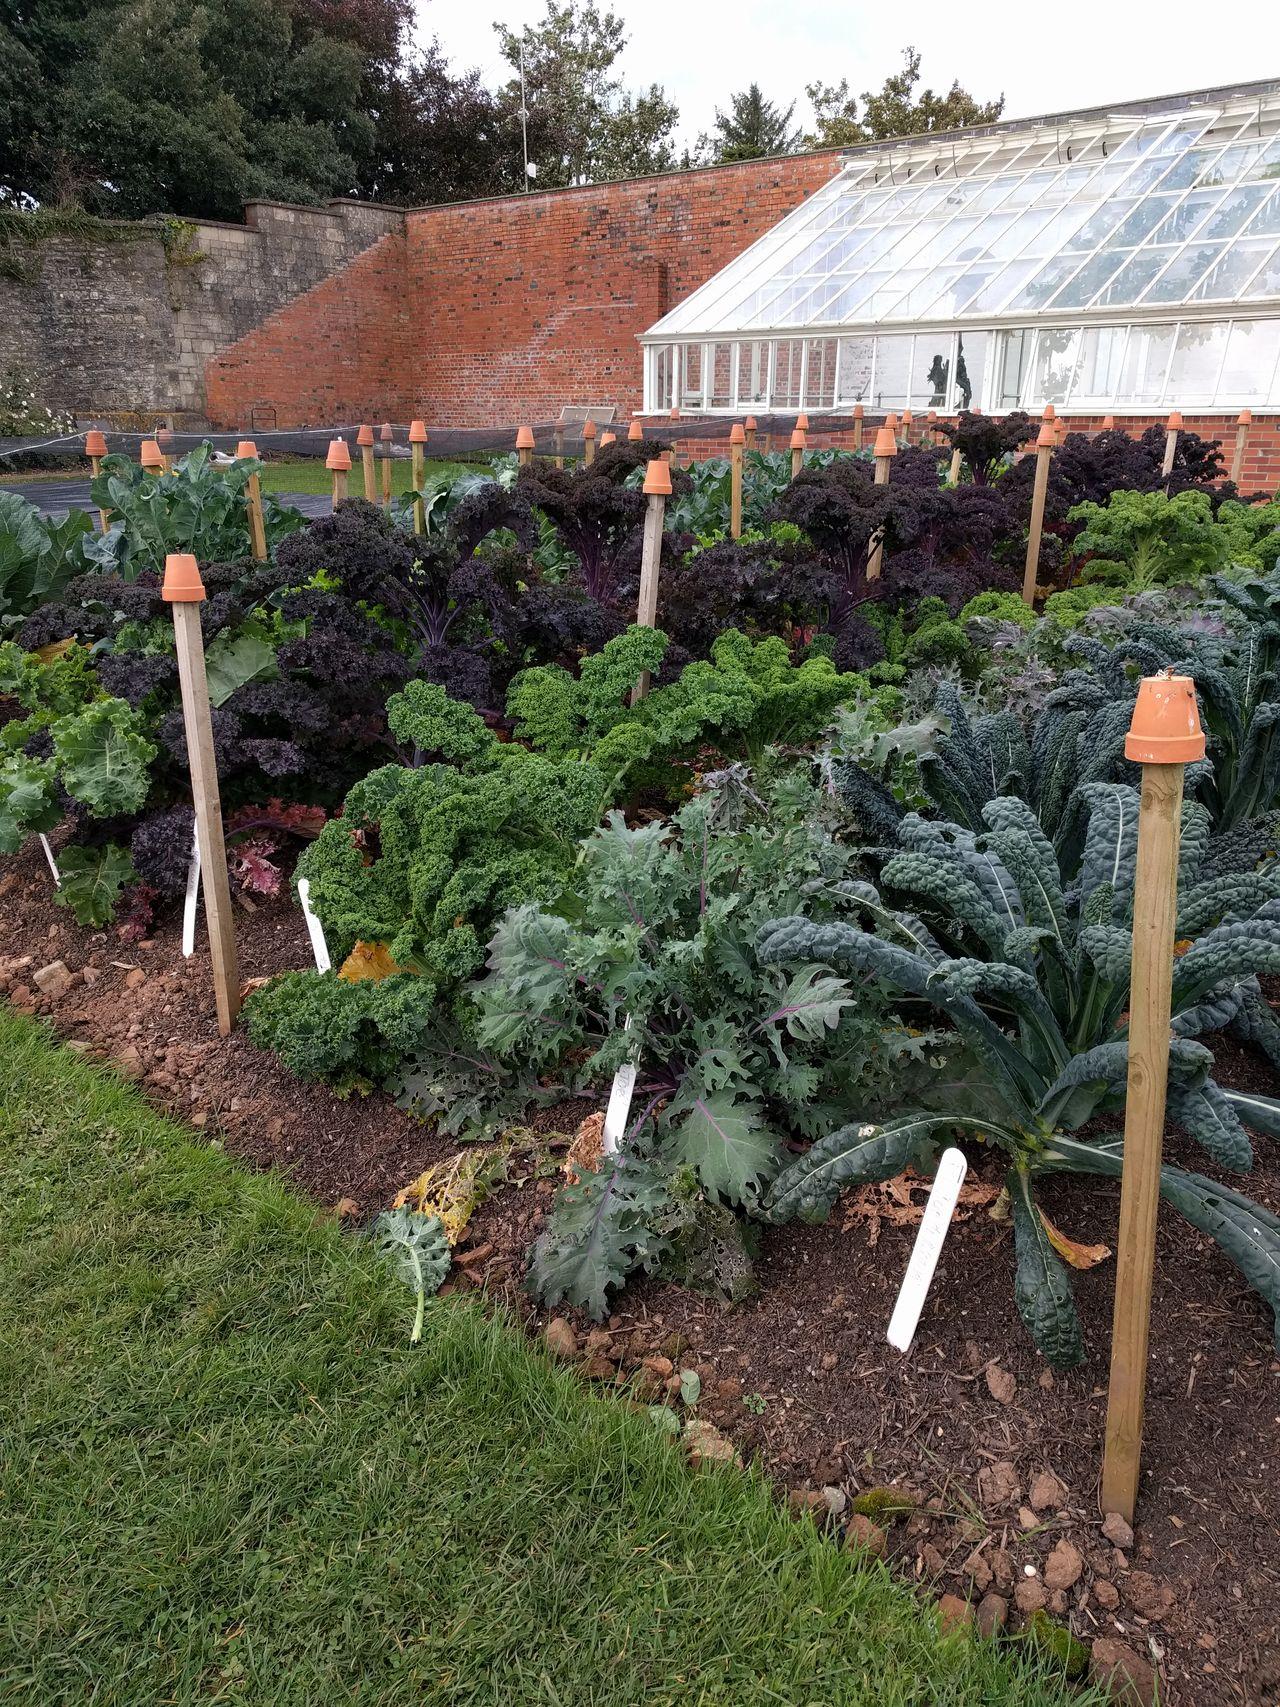 Garden, allotment, vegetables, greenhouse.